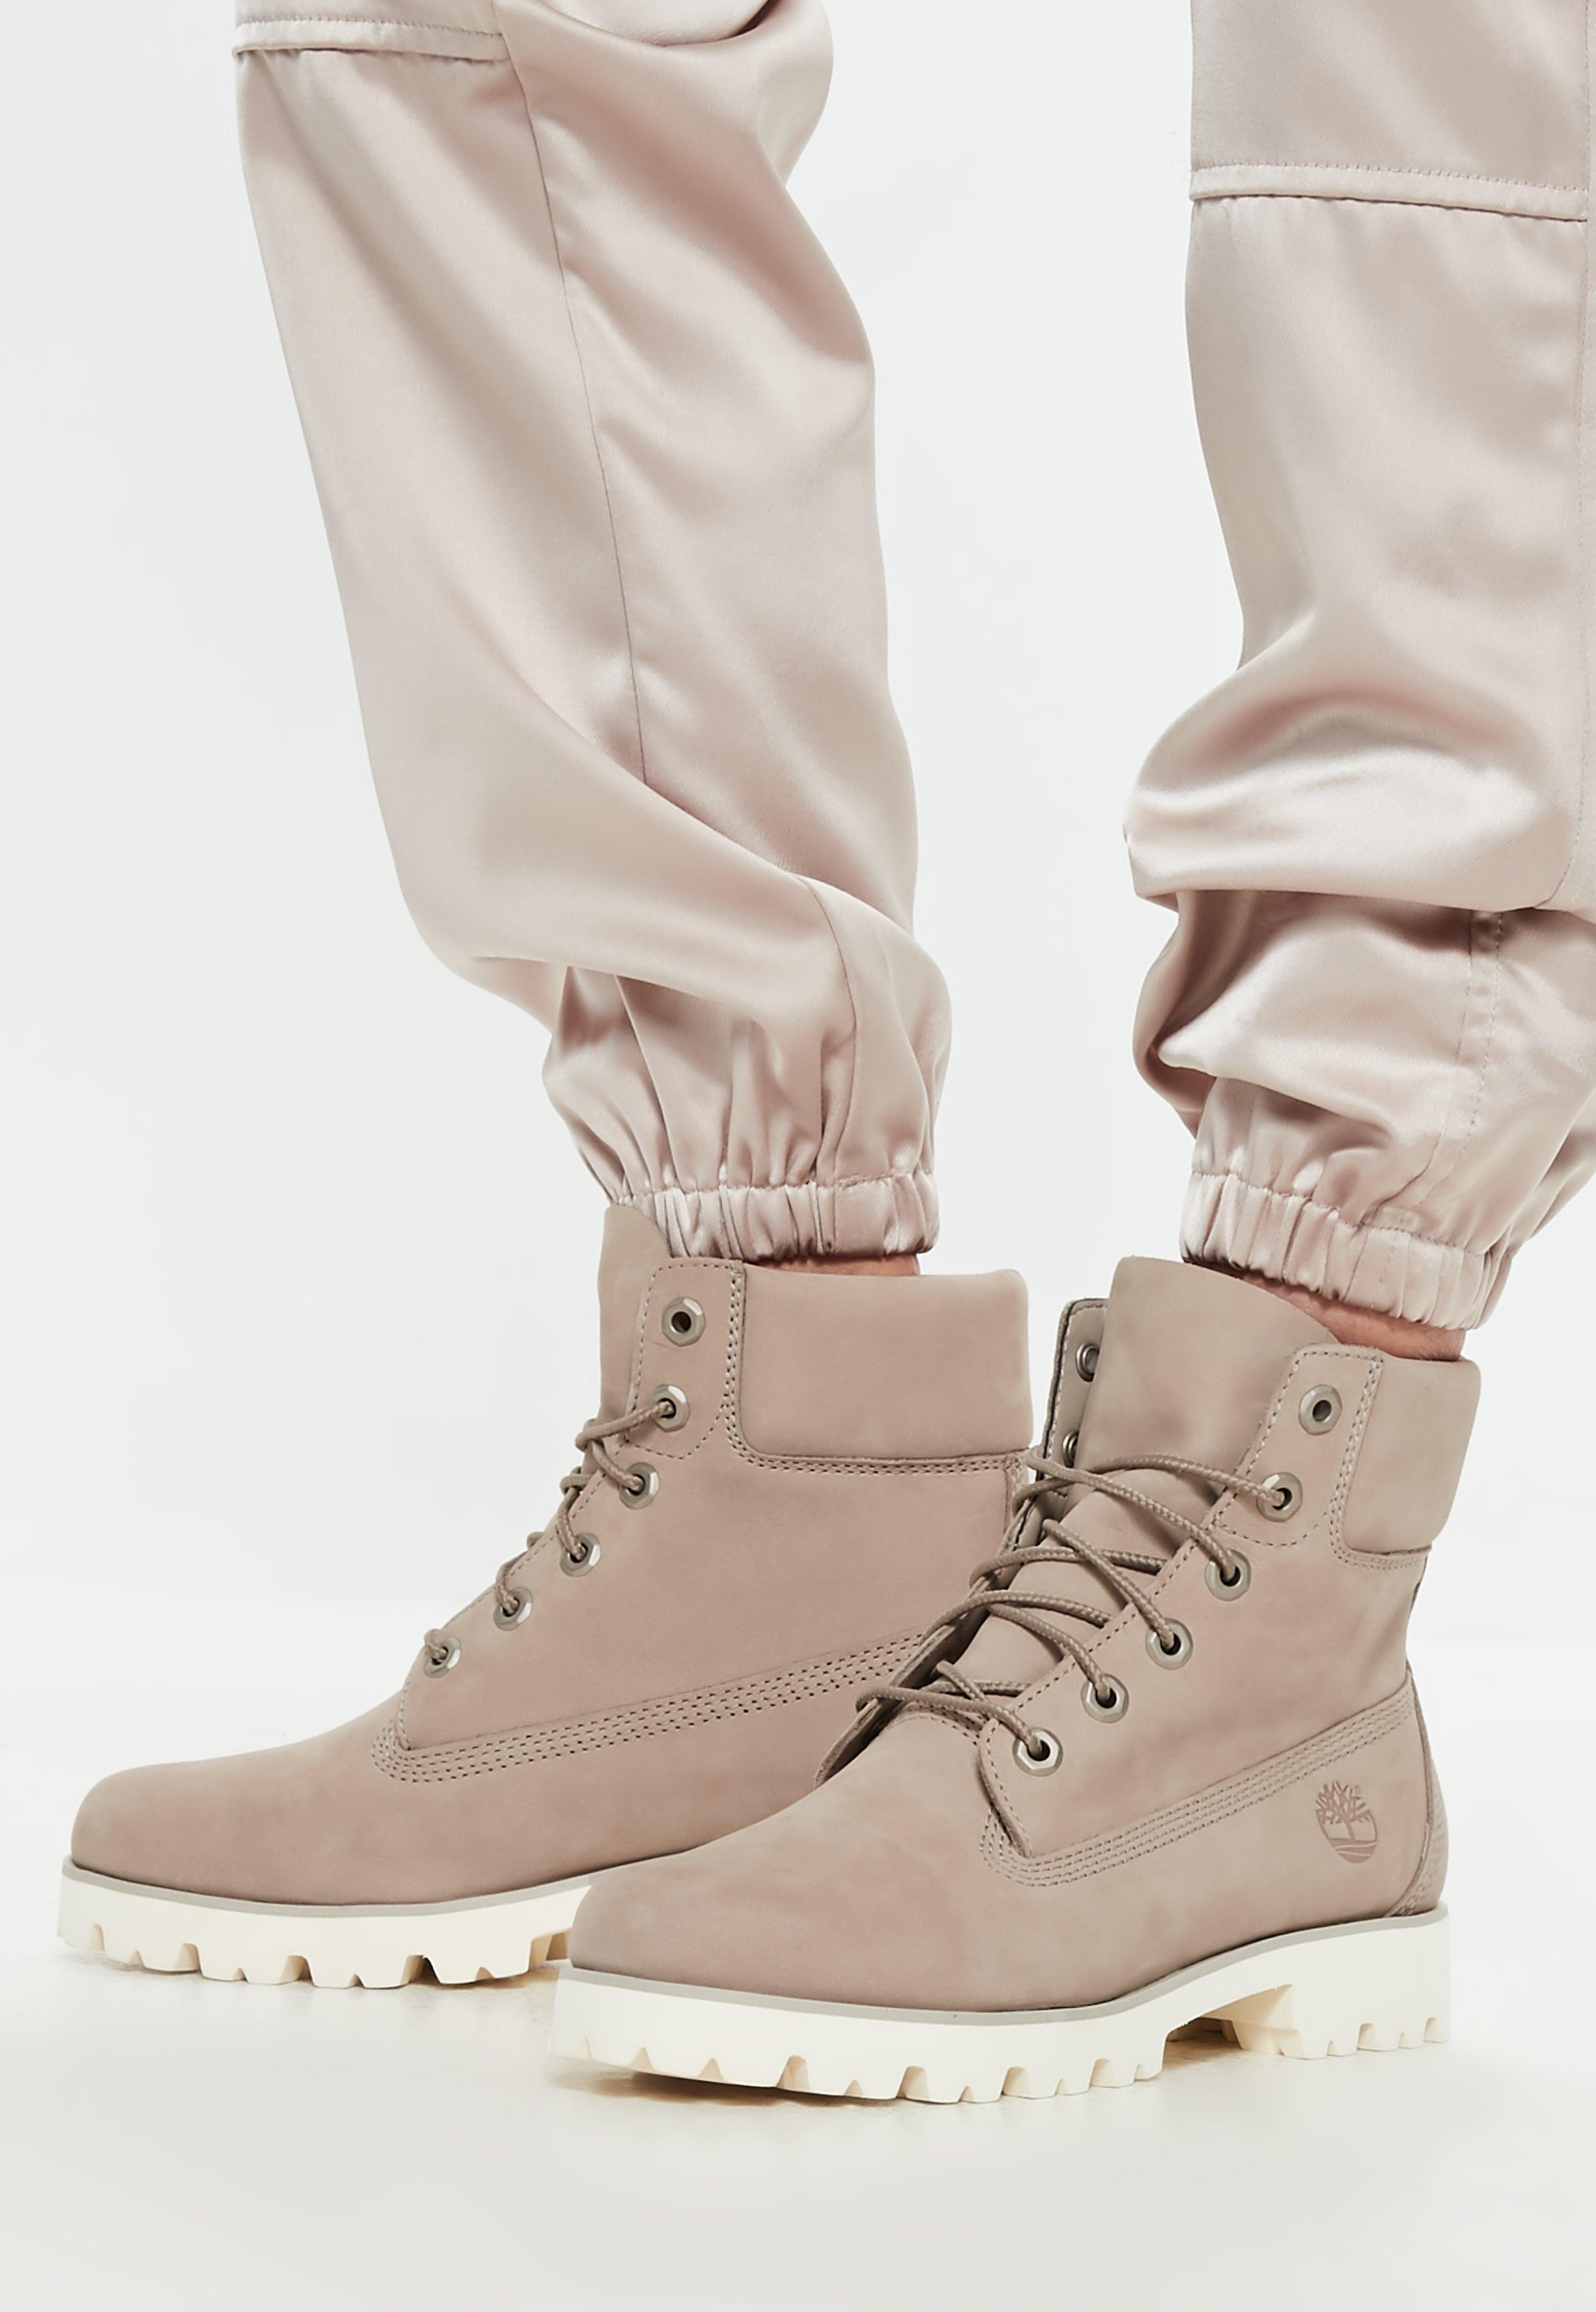 Timberland 6 Inch Light Heritage Cashmere Flat Boots o8DwU